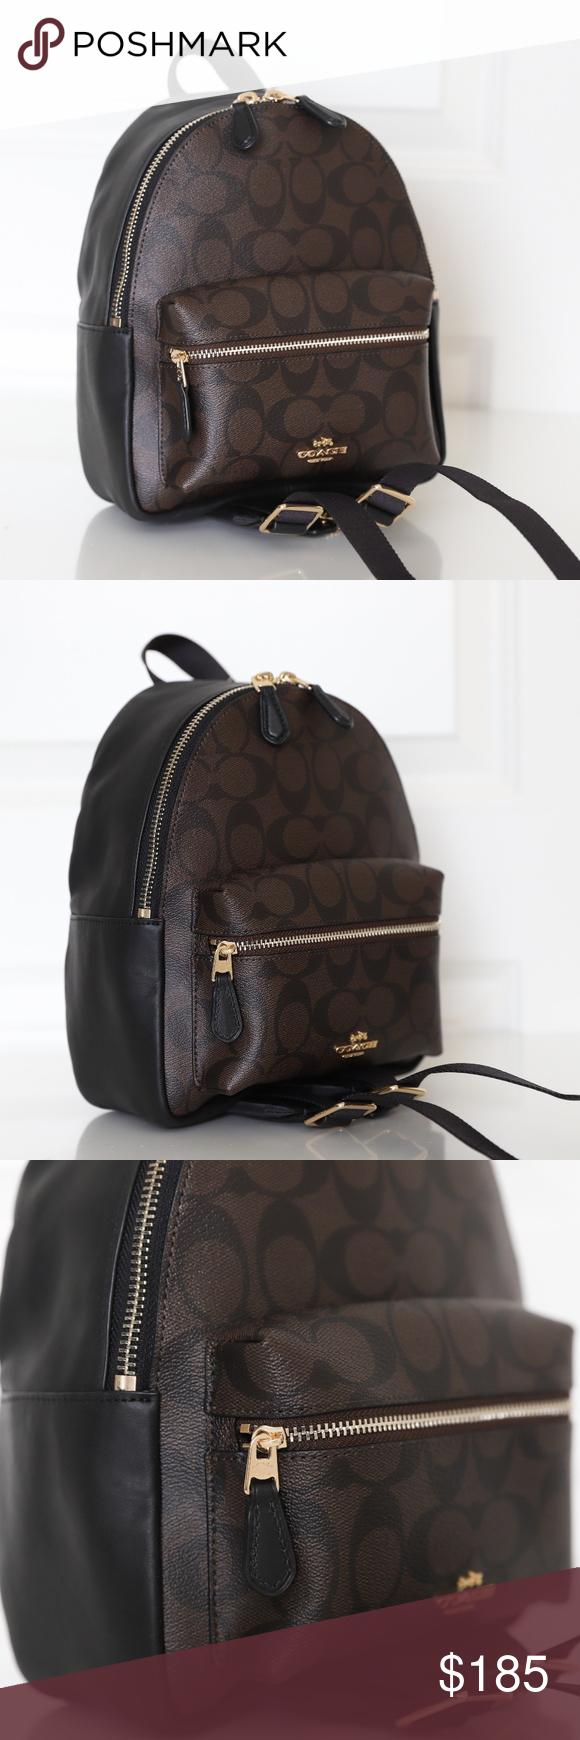 bee1eba66242 ... closeout coach f58315 mini charlie signature backpack nwt coach f58315 mini  charlie signature backpack bag brown